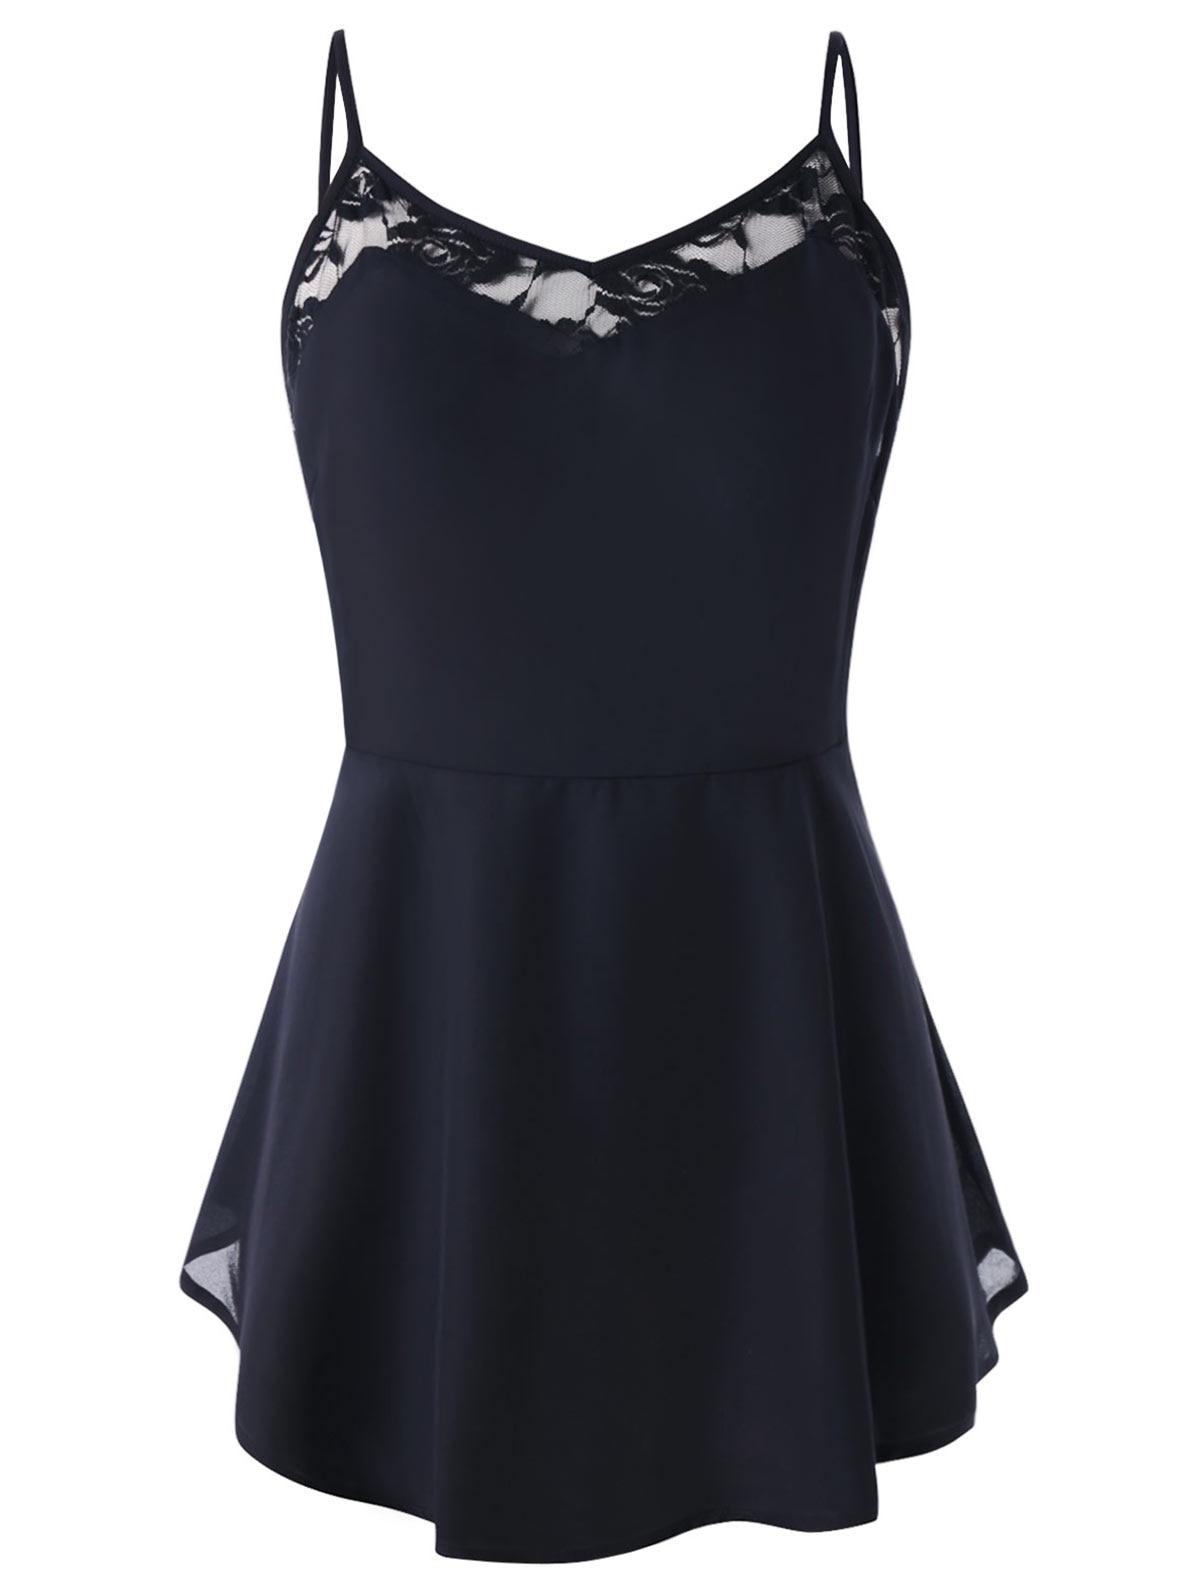 Wipalo Plus Size Lace Panel Spaghetti Strap Peplum T-Shirt Women Sleeveless Summer Camis High Waist Ladies Tops Tees